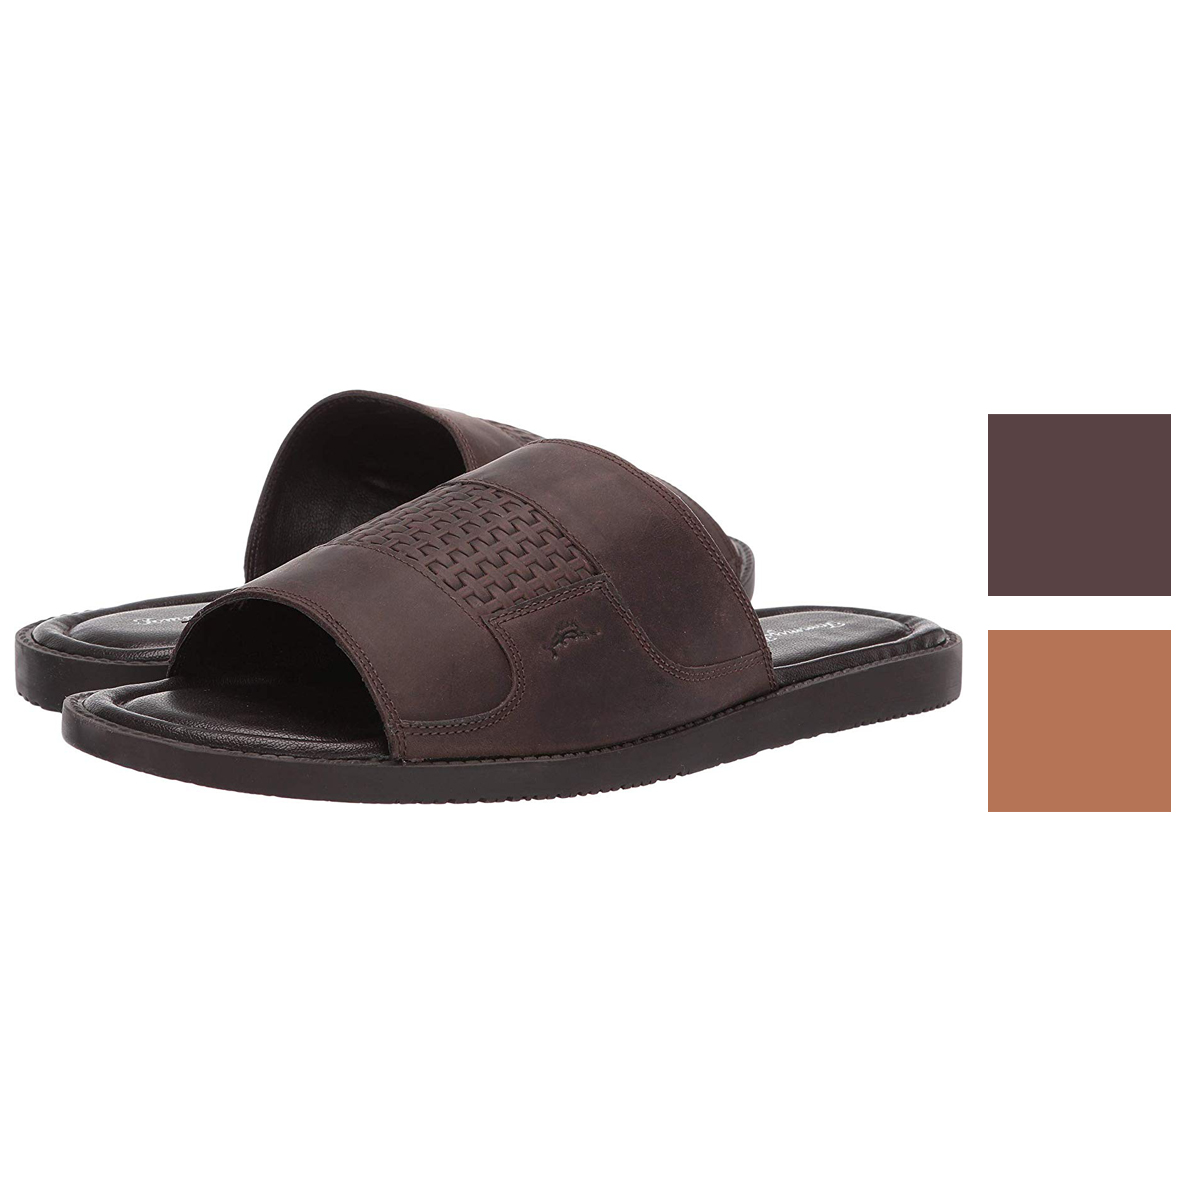 HULIUP Mens Belt Mens Belt Luxury Automatic Buckle Leather Belt Mens Belt 3.5 cm Width